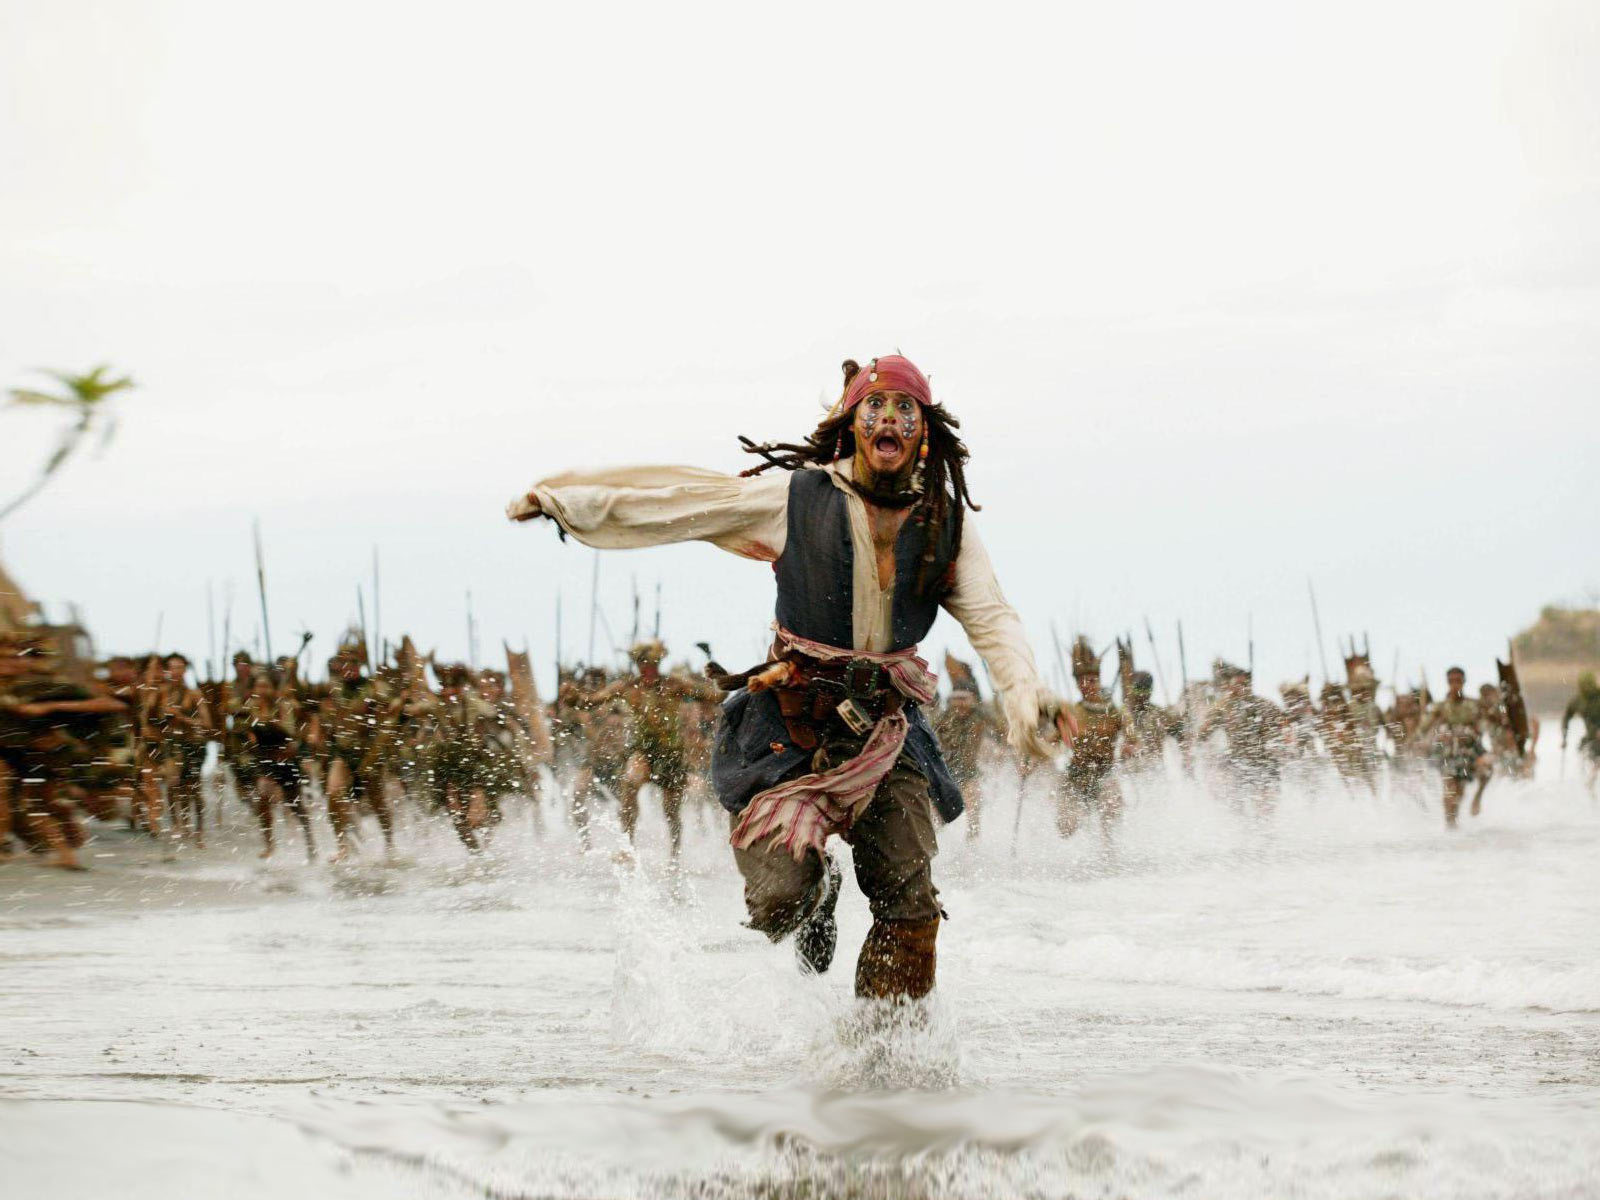 Pirates Wallpaper   Pirates of the Caribbean Wallpaper 2783003 1600x1200